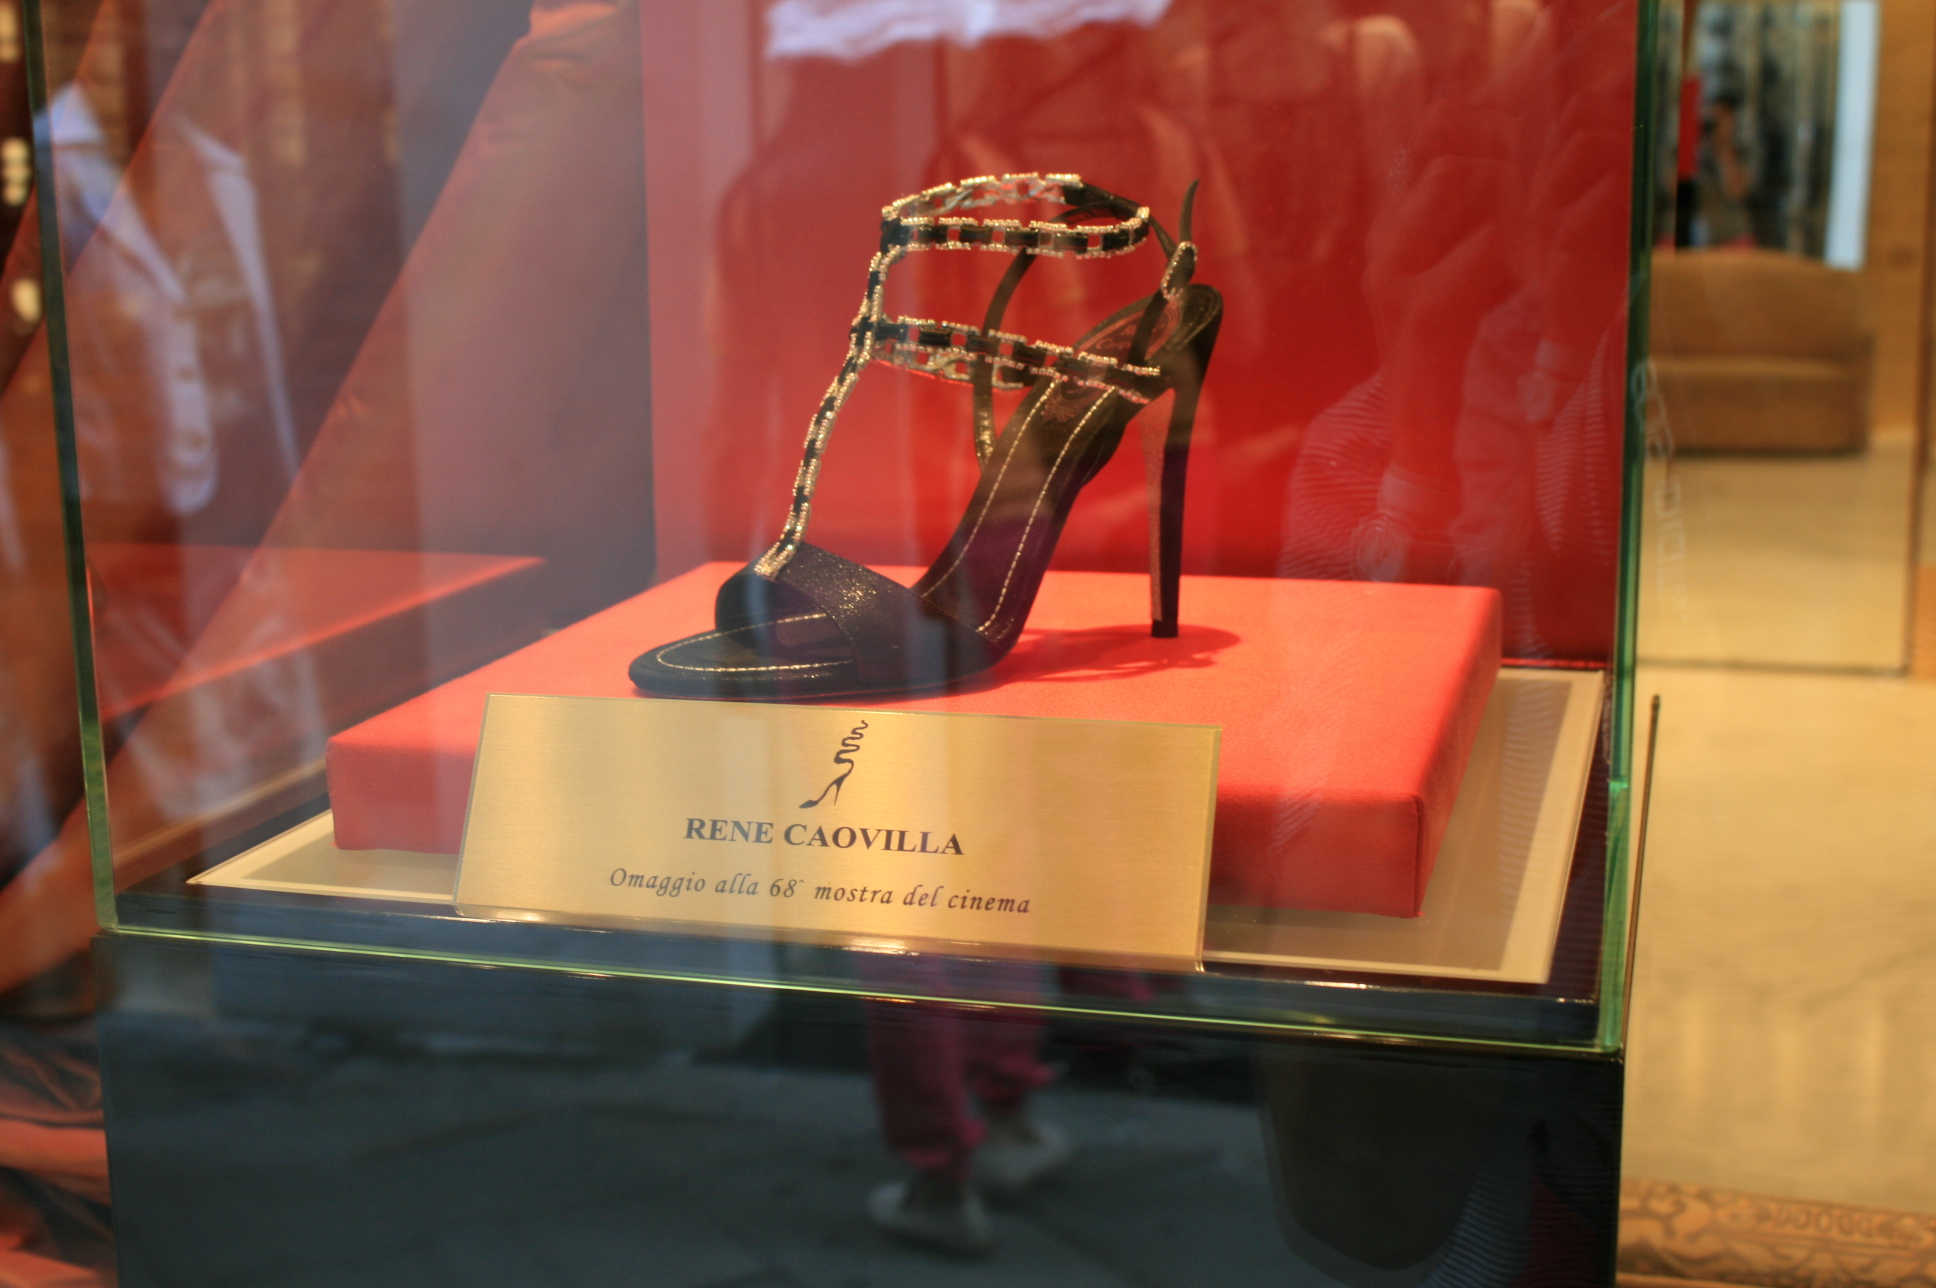 renè caovilla festival di venezia venice 2011 red carpet heel sandalo